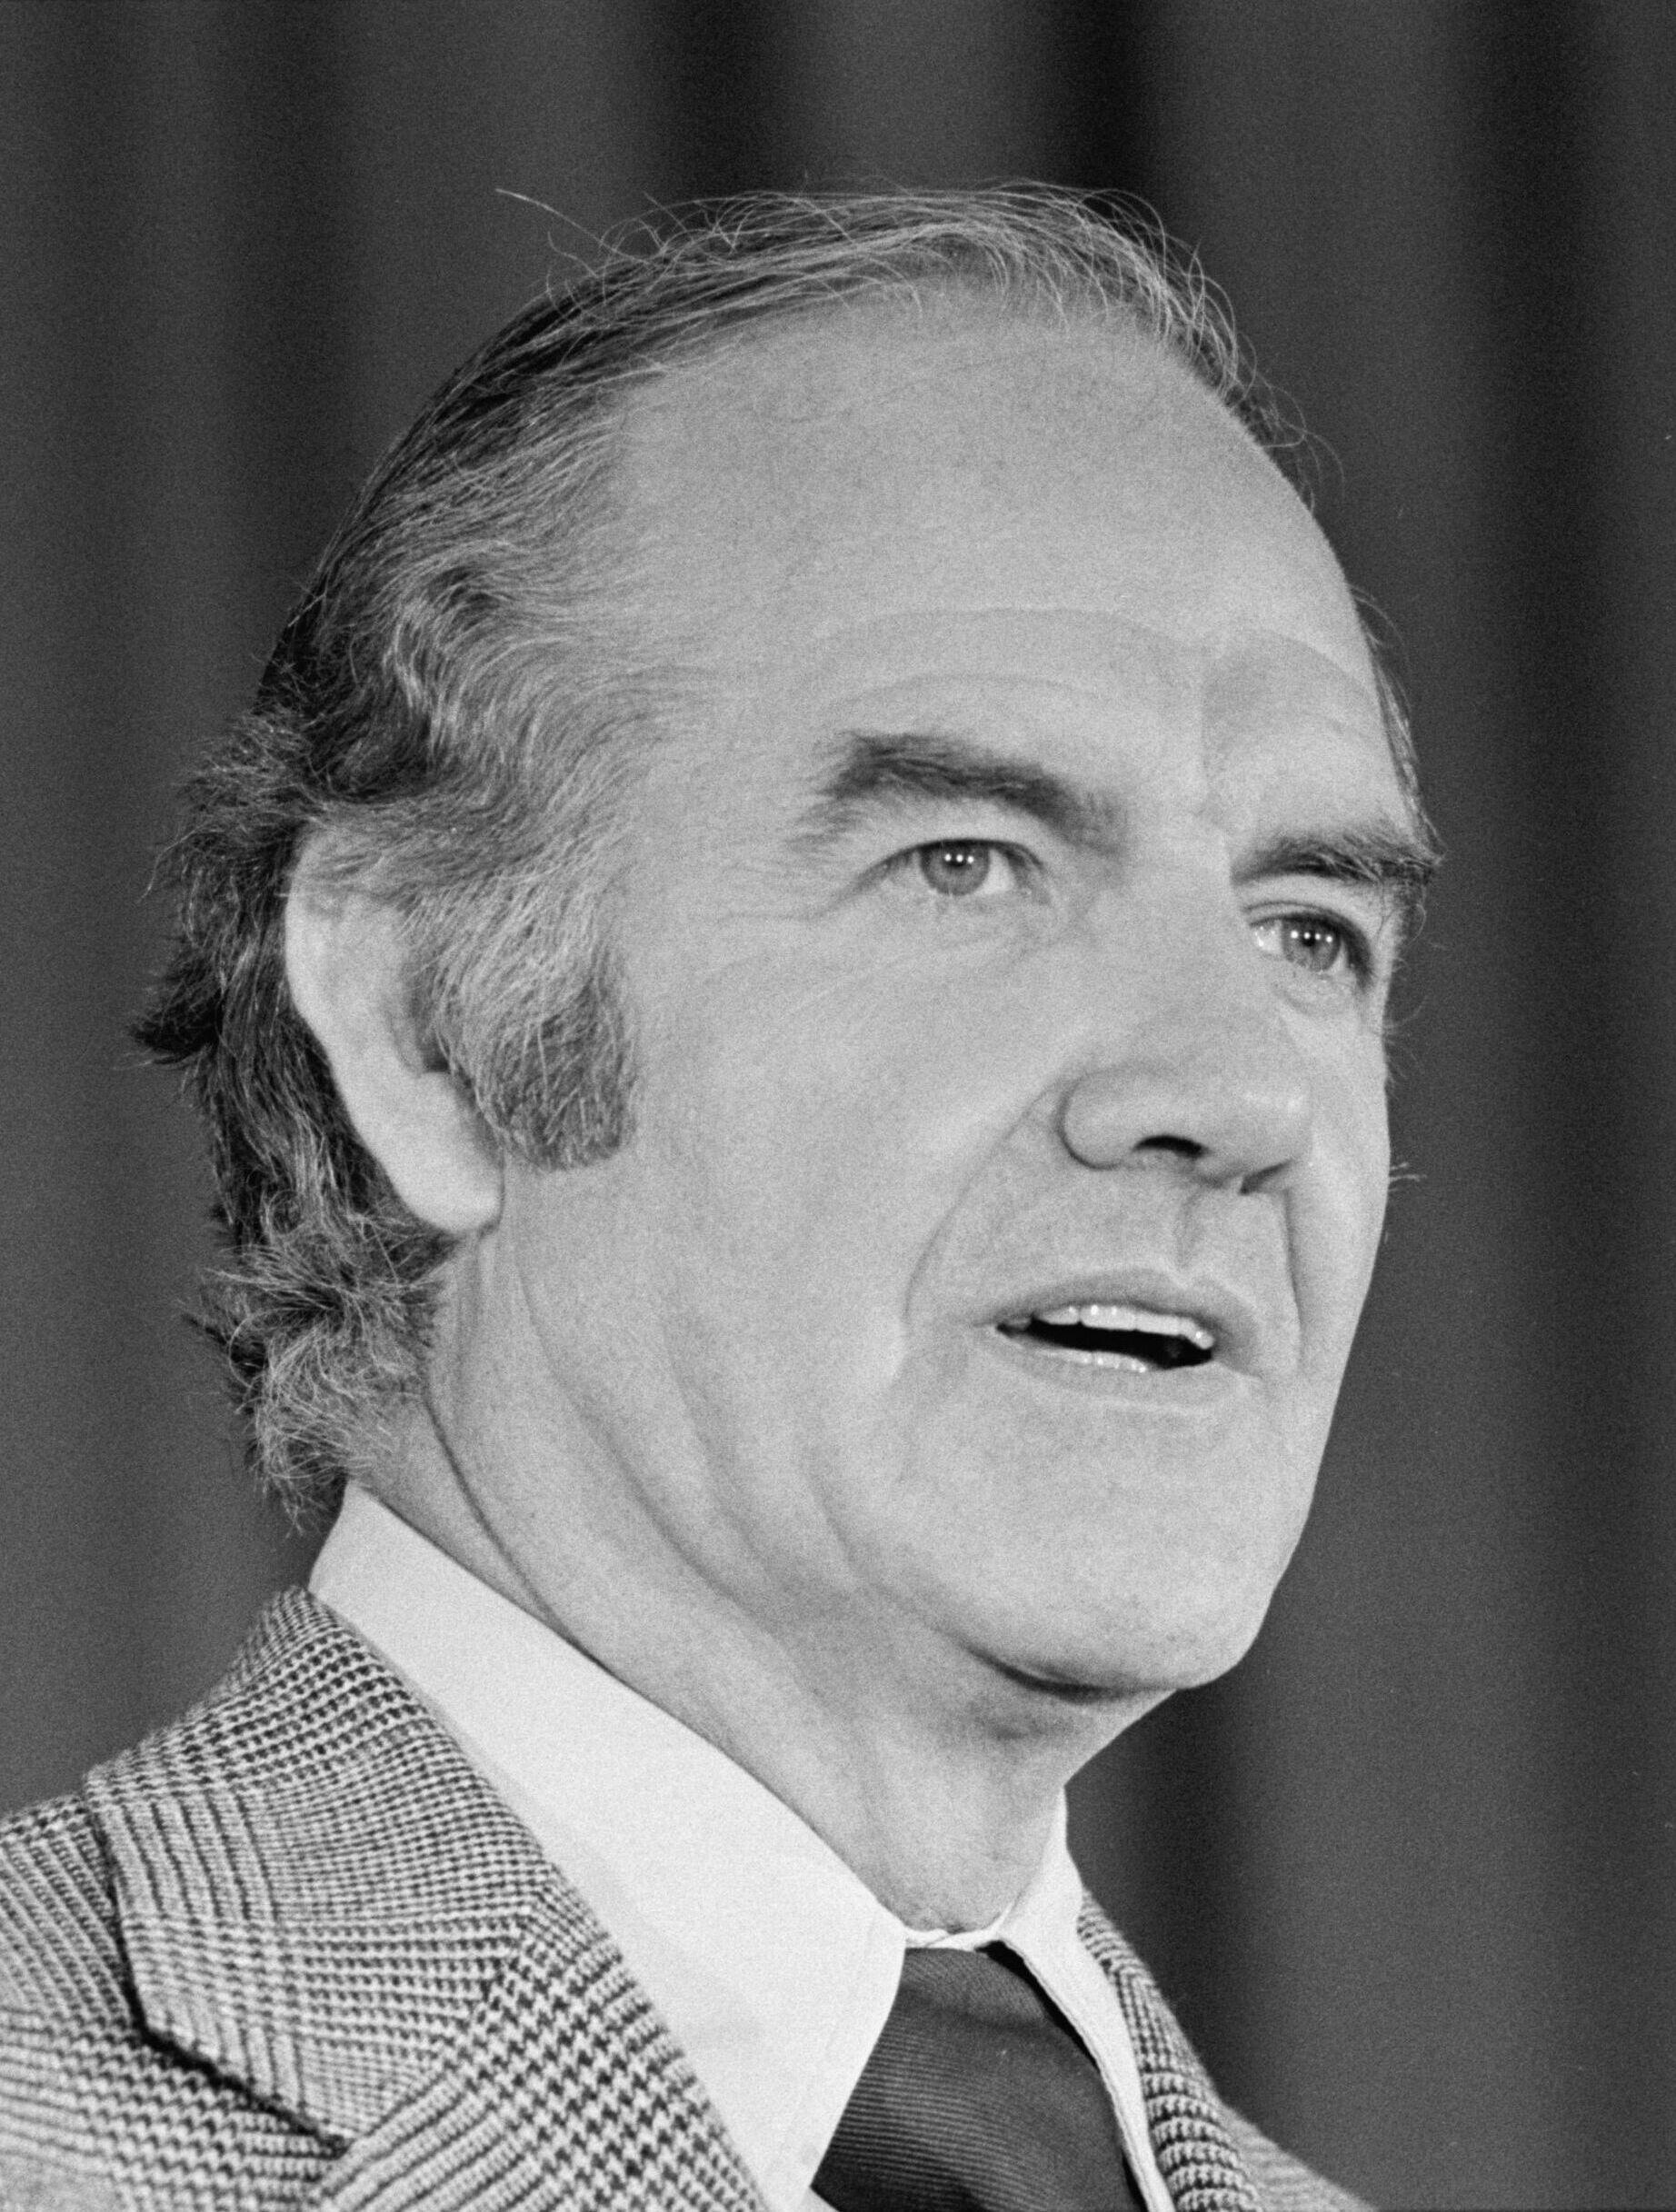 24c25baf50a George McGovern - Wikipedia